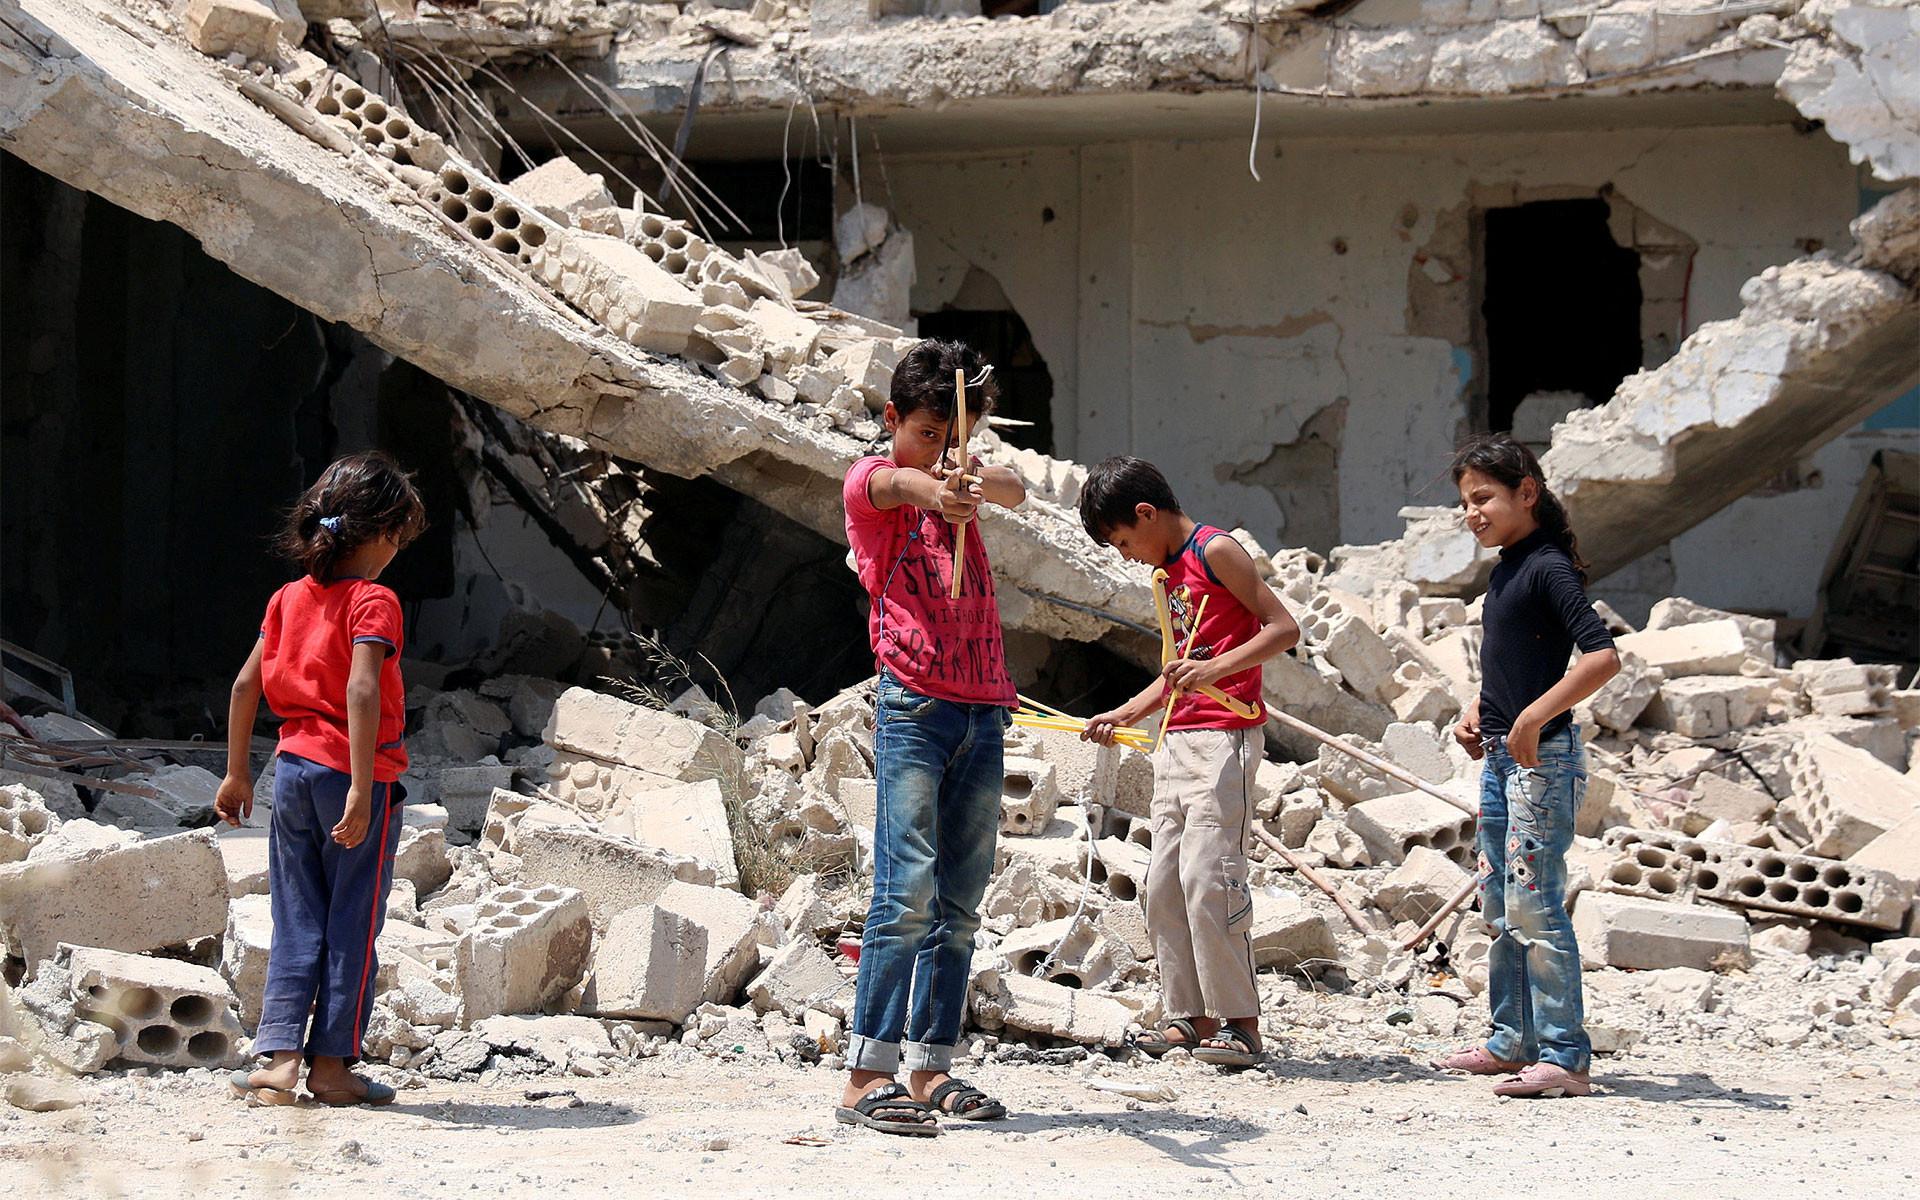 <p><span>Фото: &copy; REUTERS/Alaa al-Faqir</span></p>